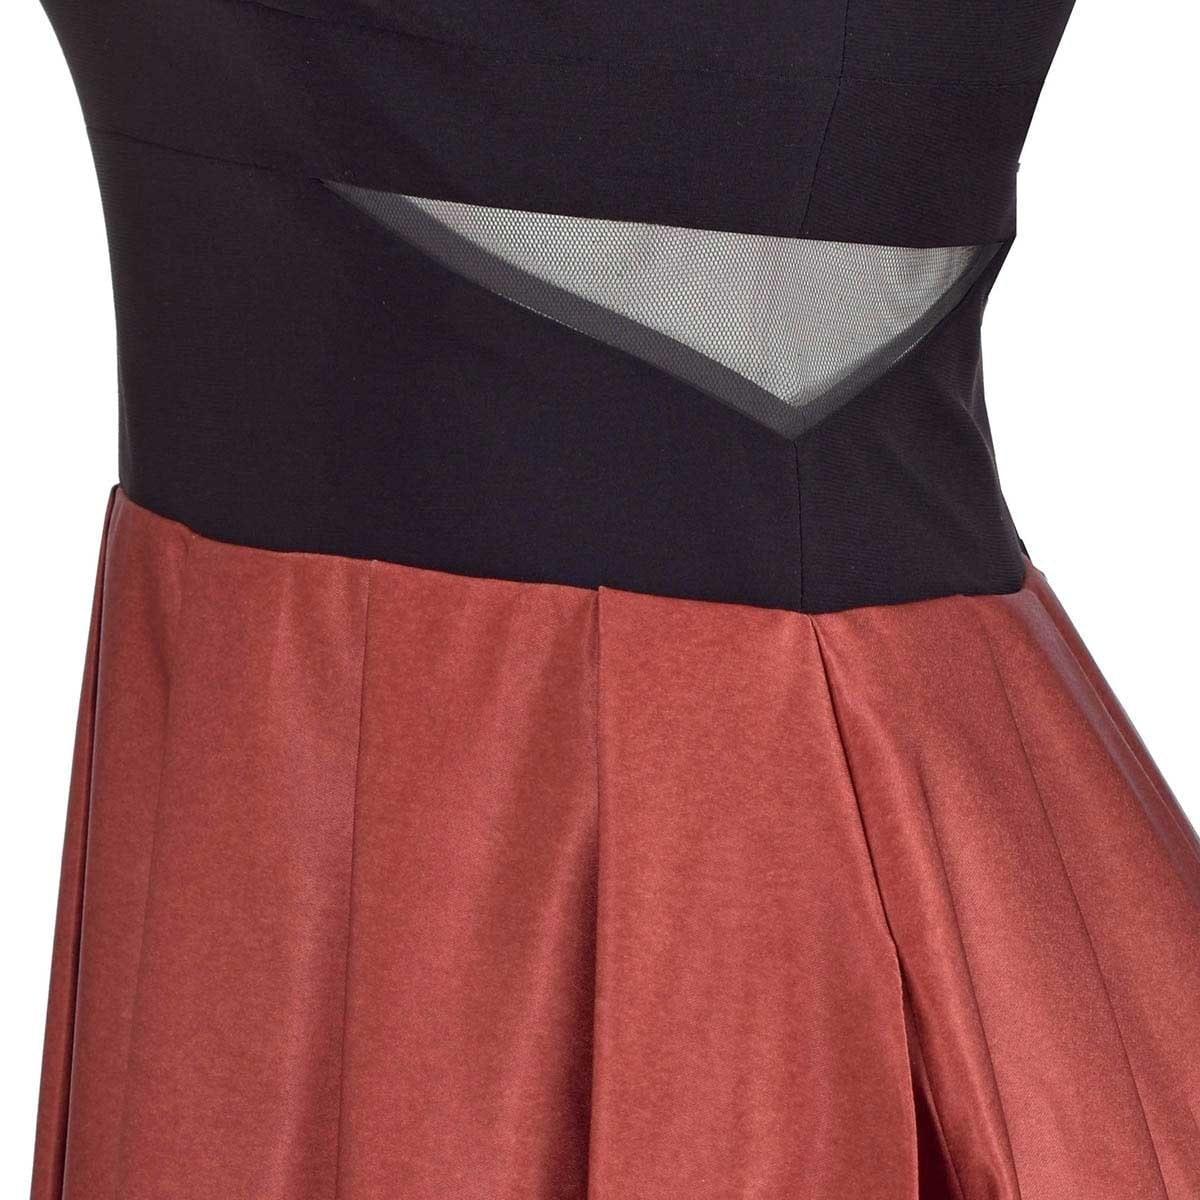 Vestido de Fiesta Largo Escote V Falda Estampada